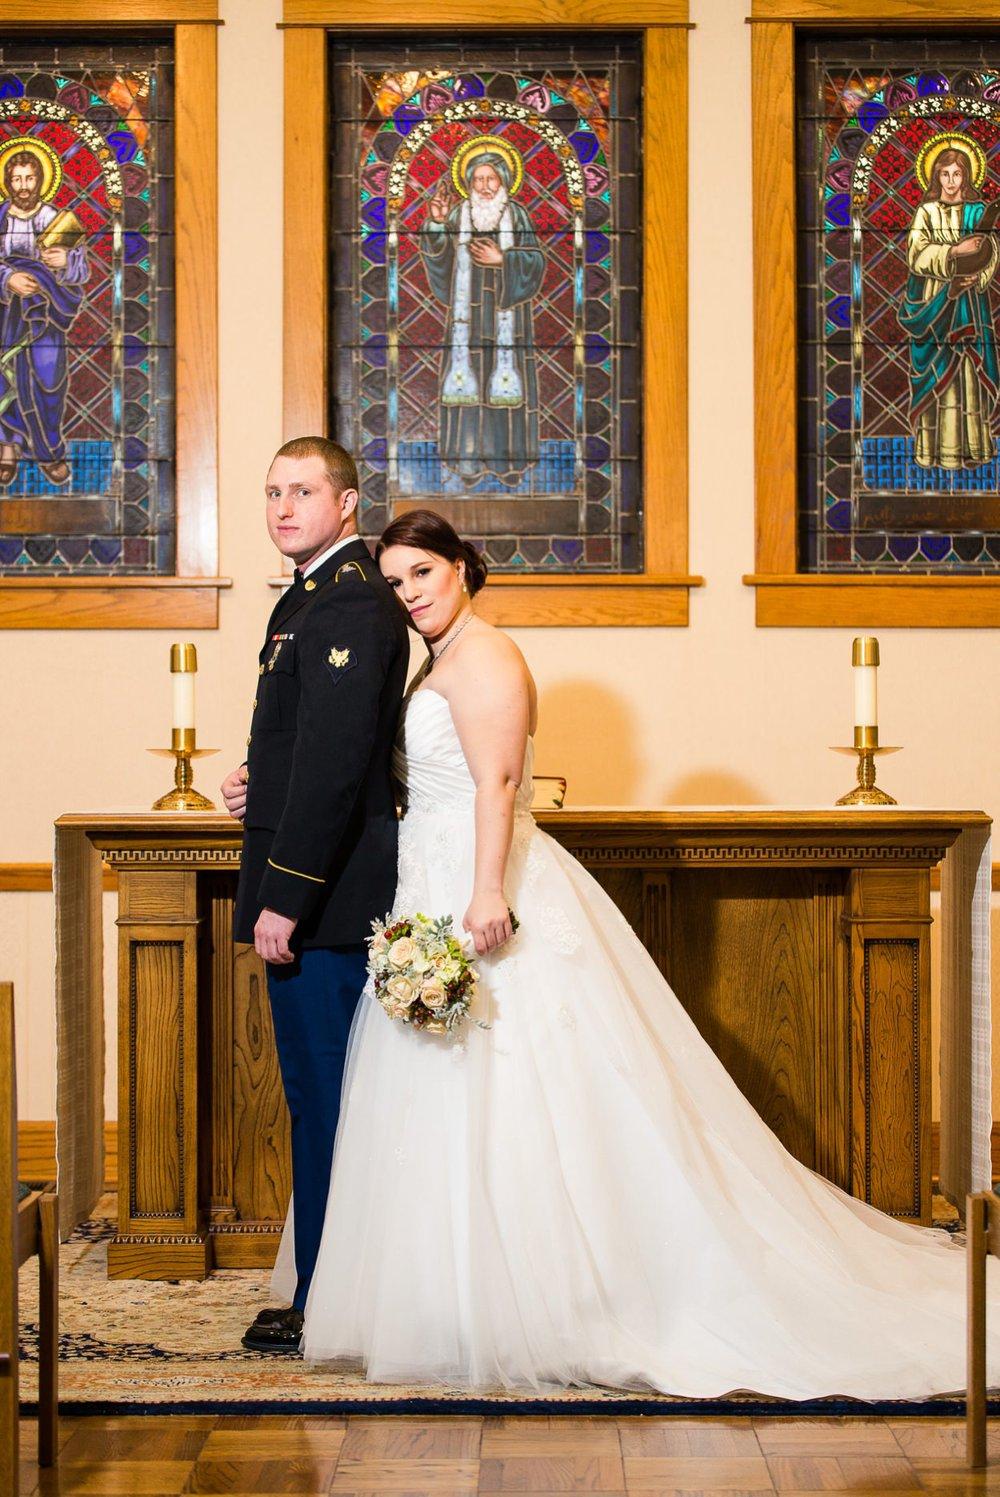 oklahoma-wedding-photographer_0050.jpg